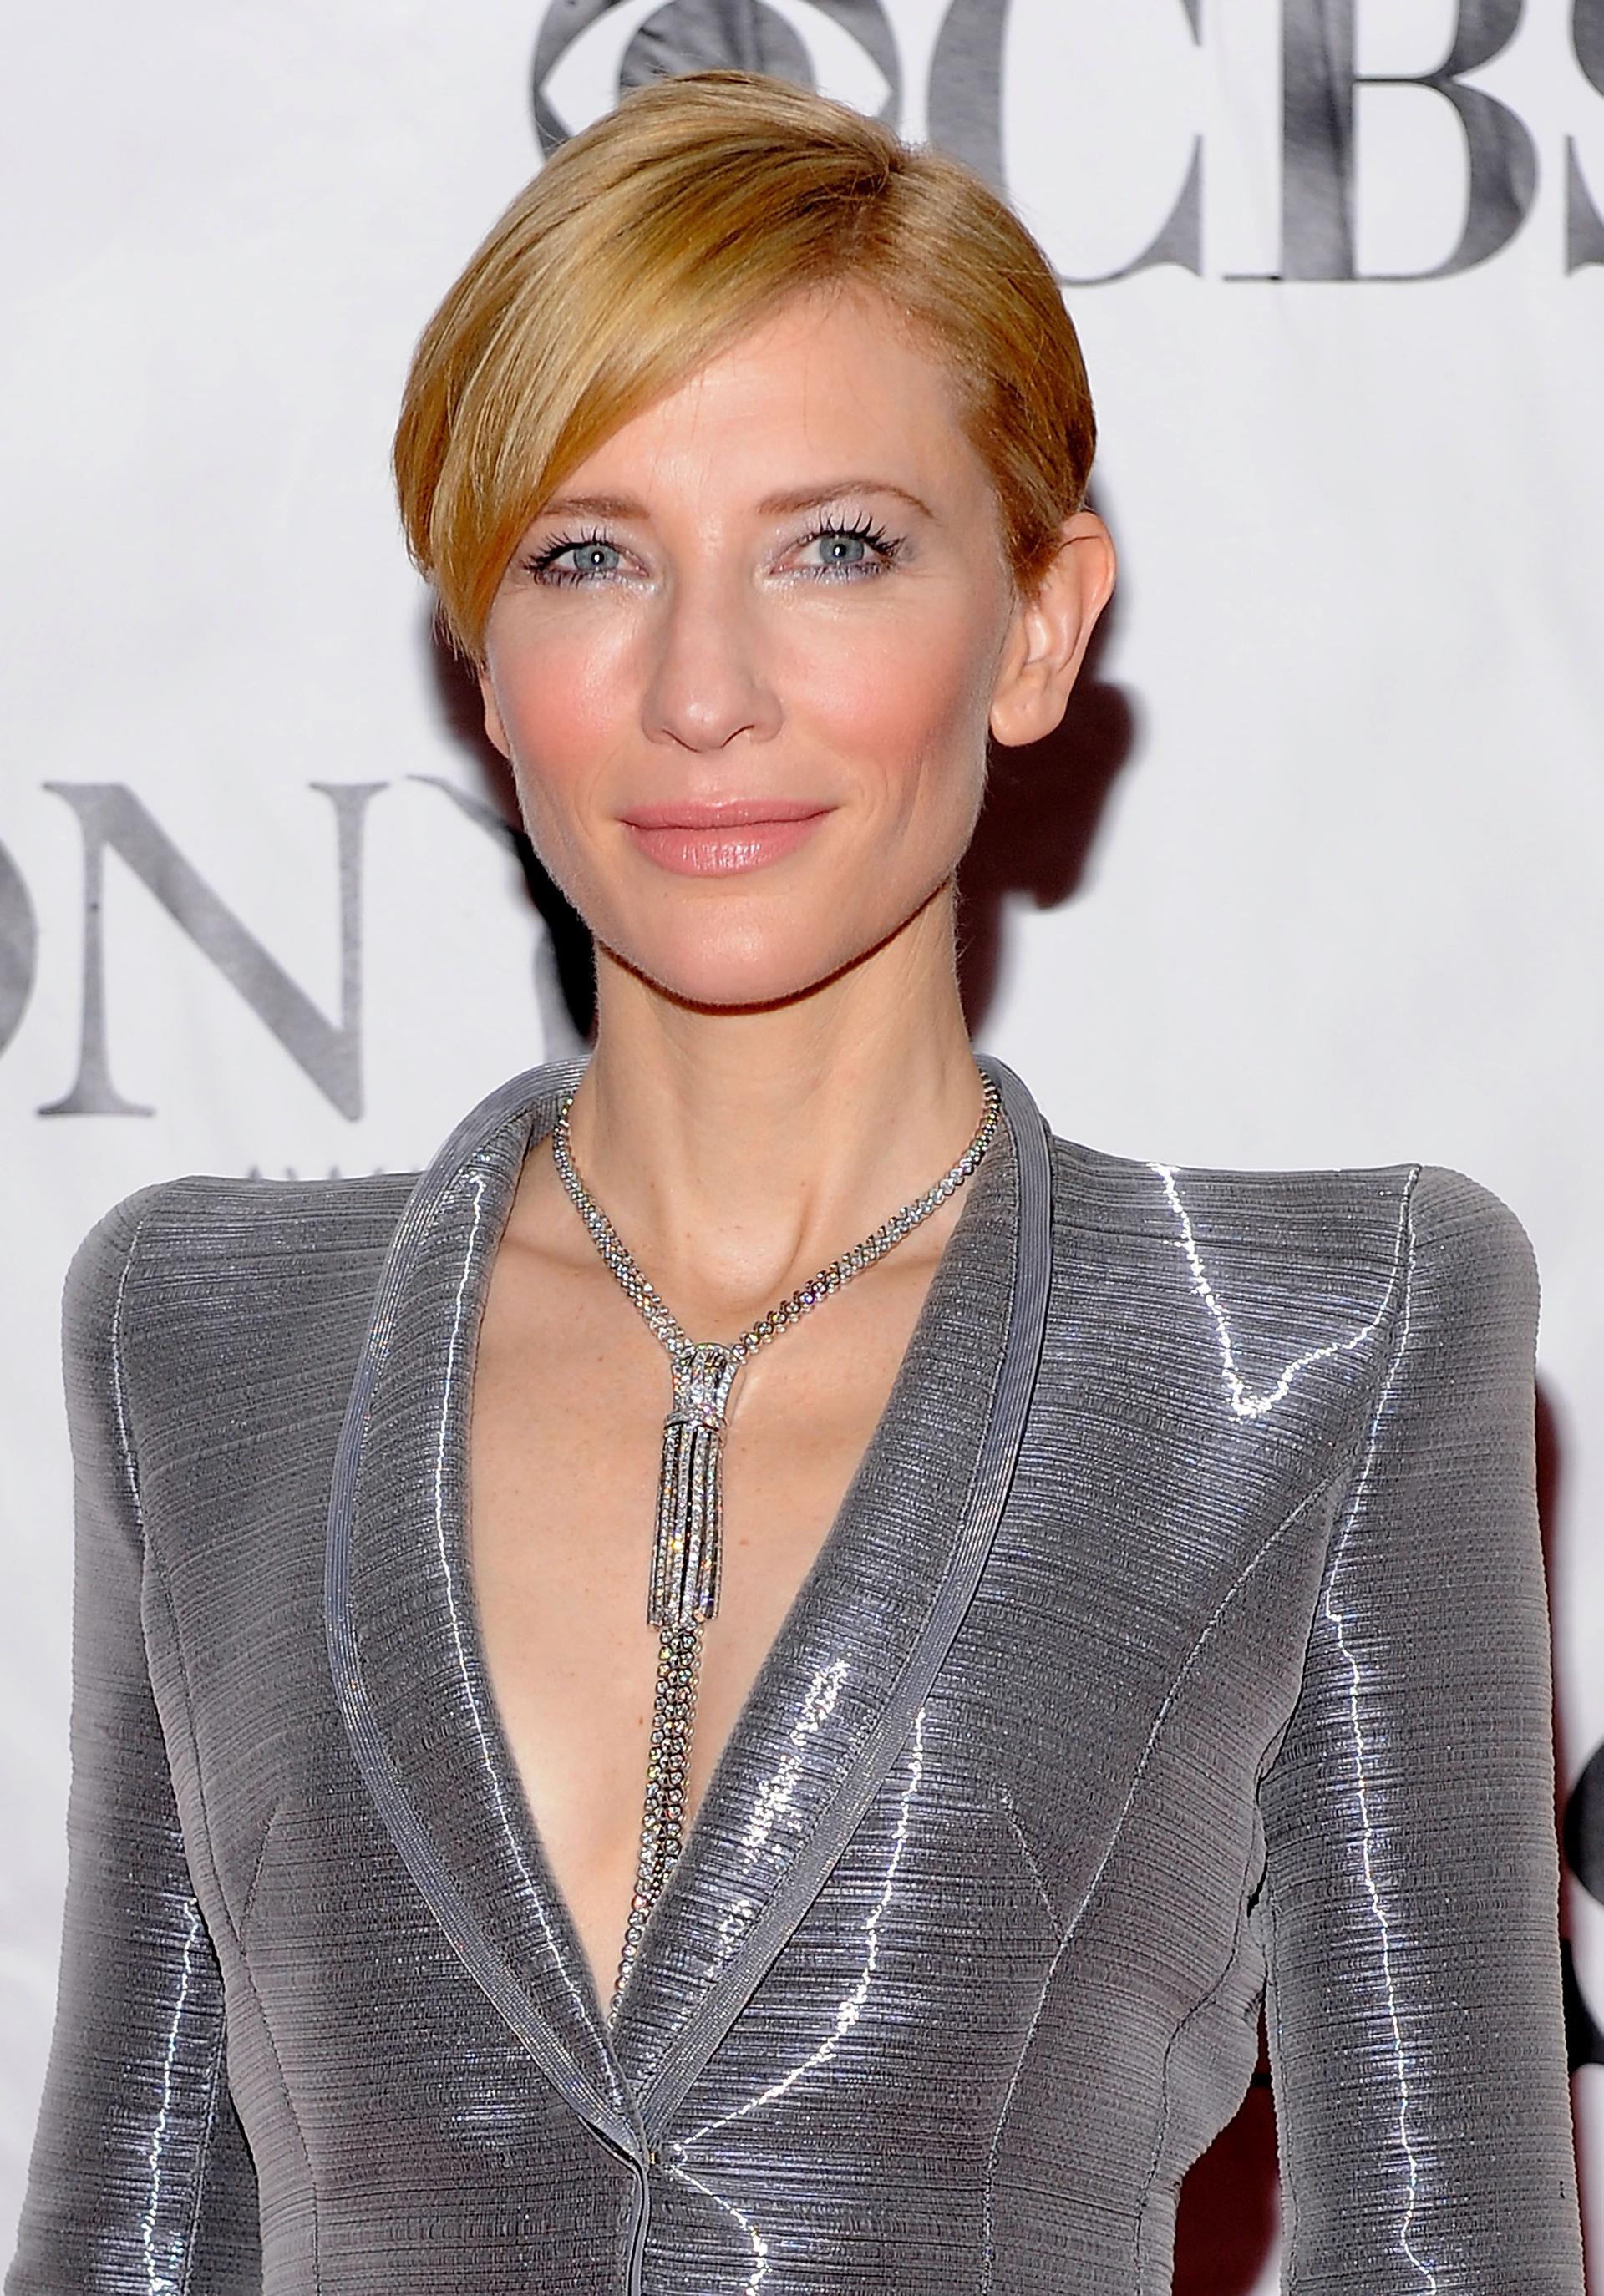 Cate Blanchett's pixie cut